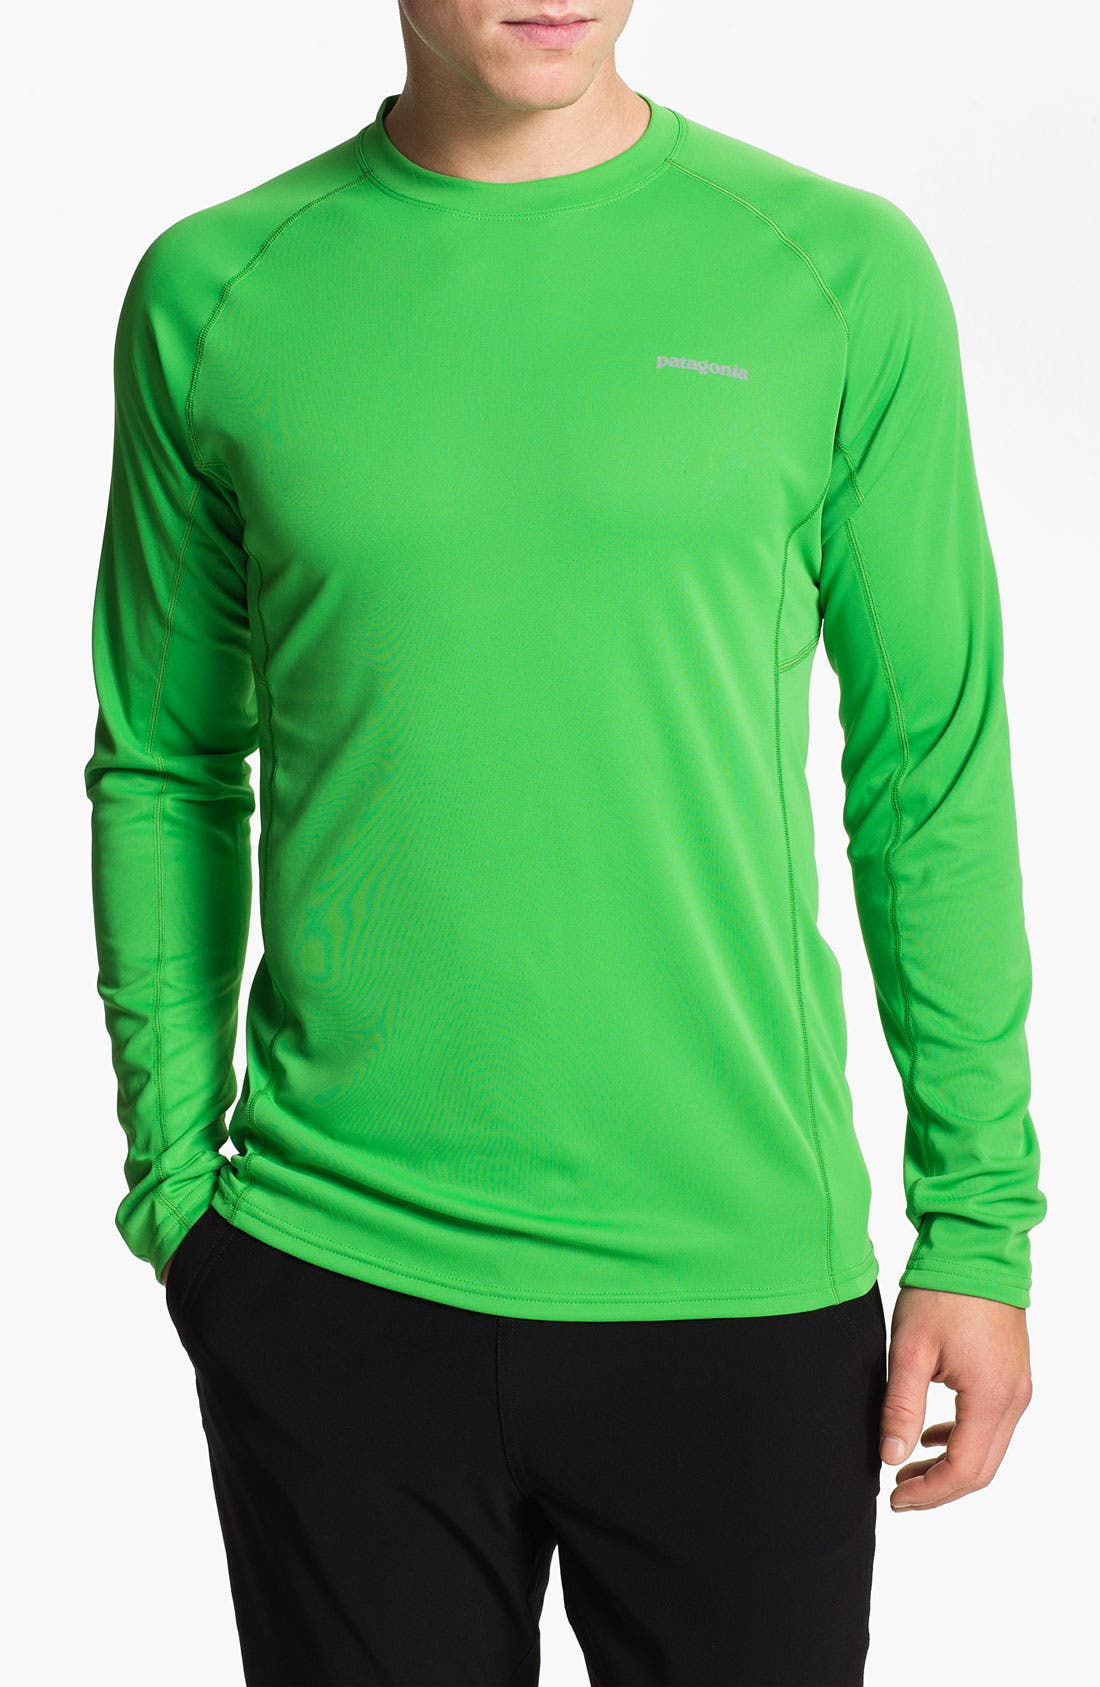 Main Image - Patagonia 'Fore Runner' Long Sleeve T-Shirt